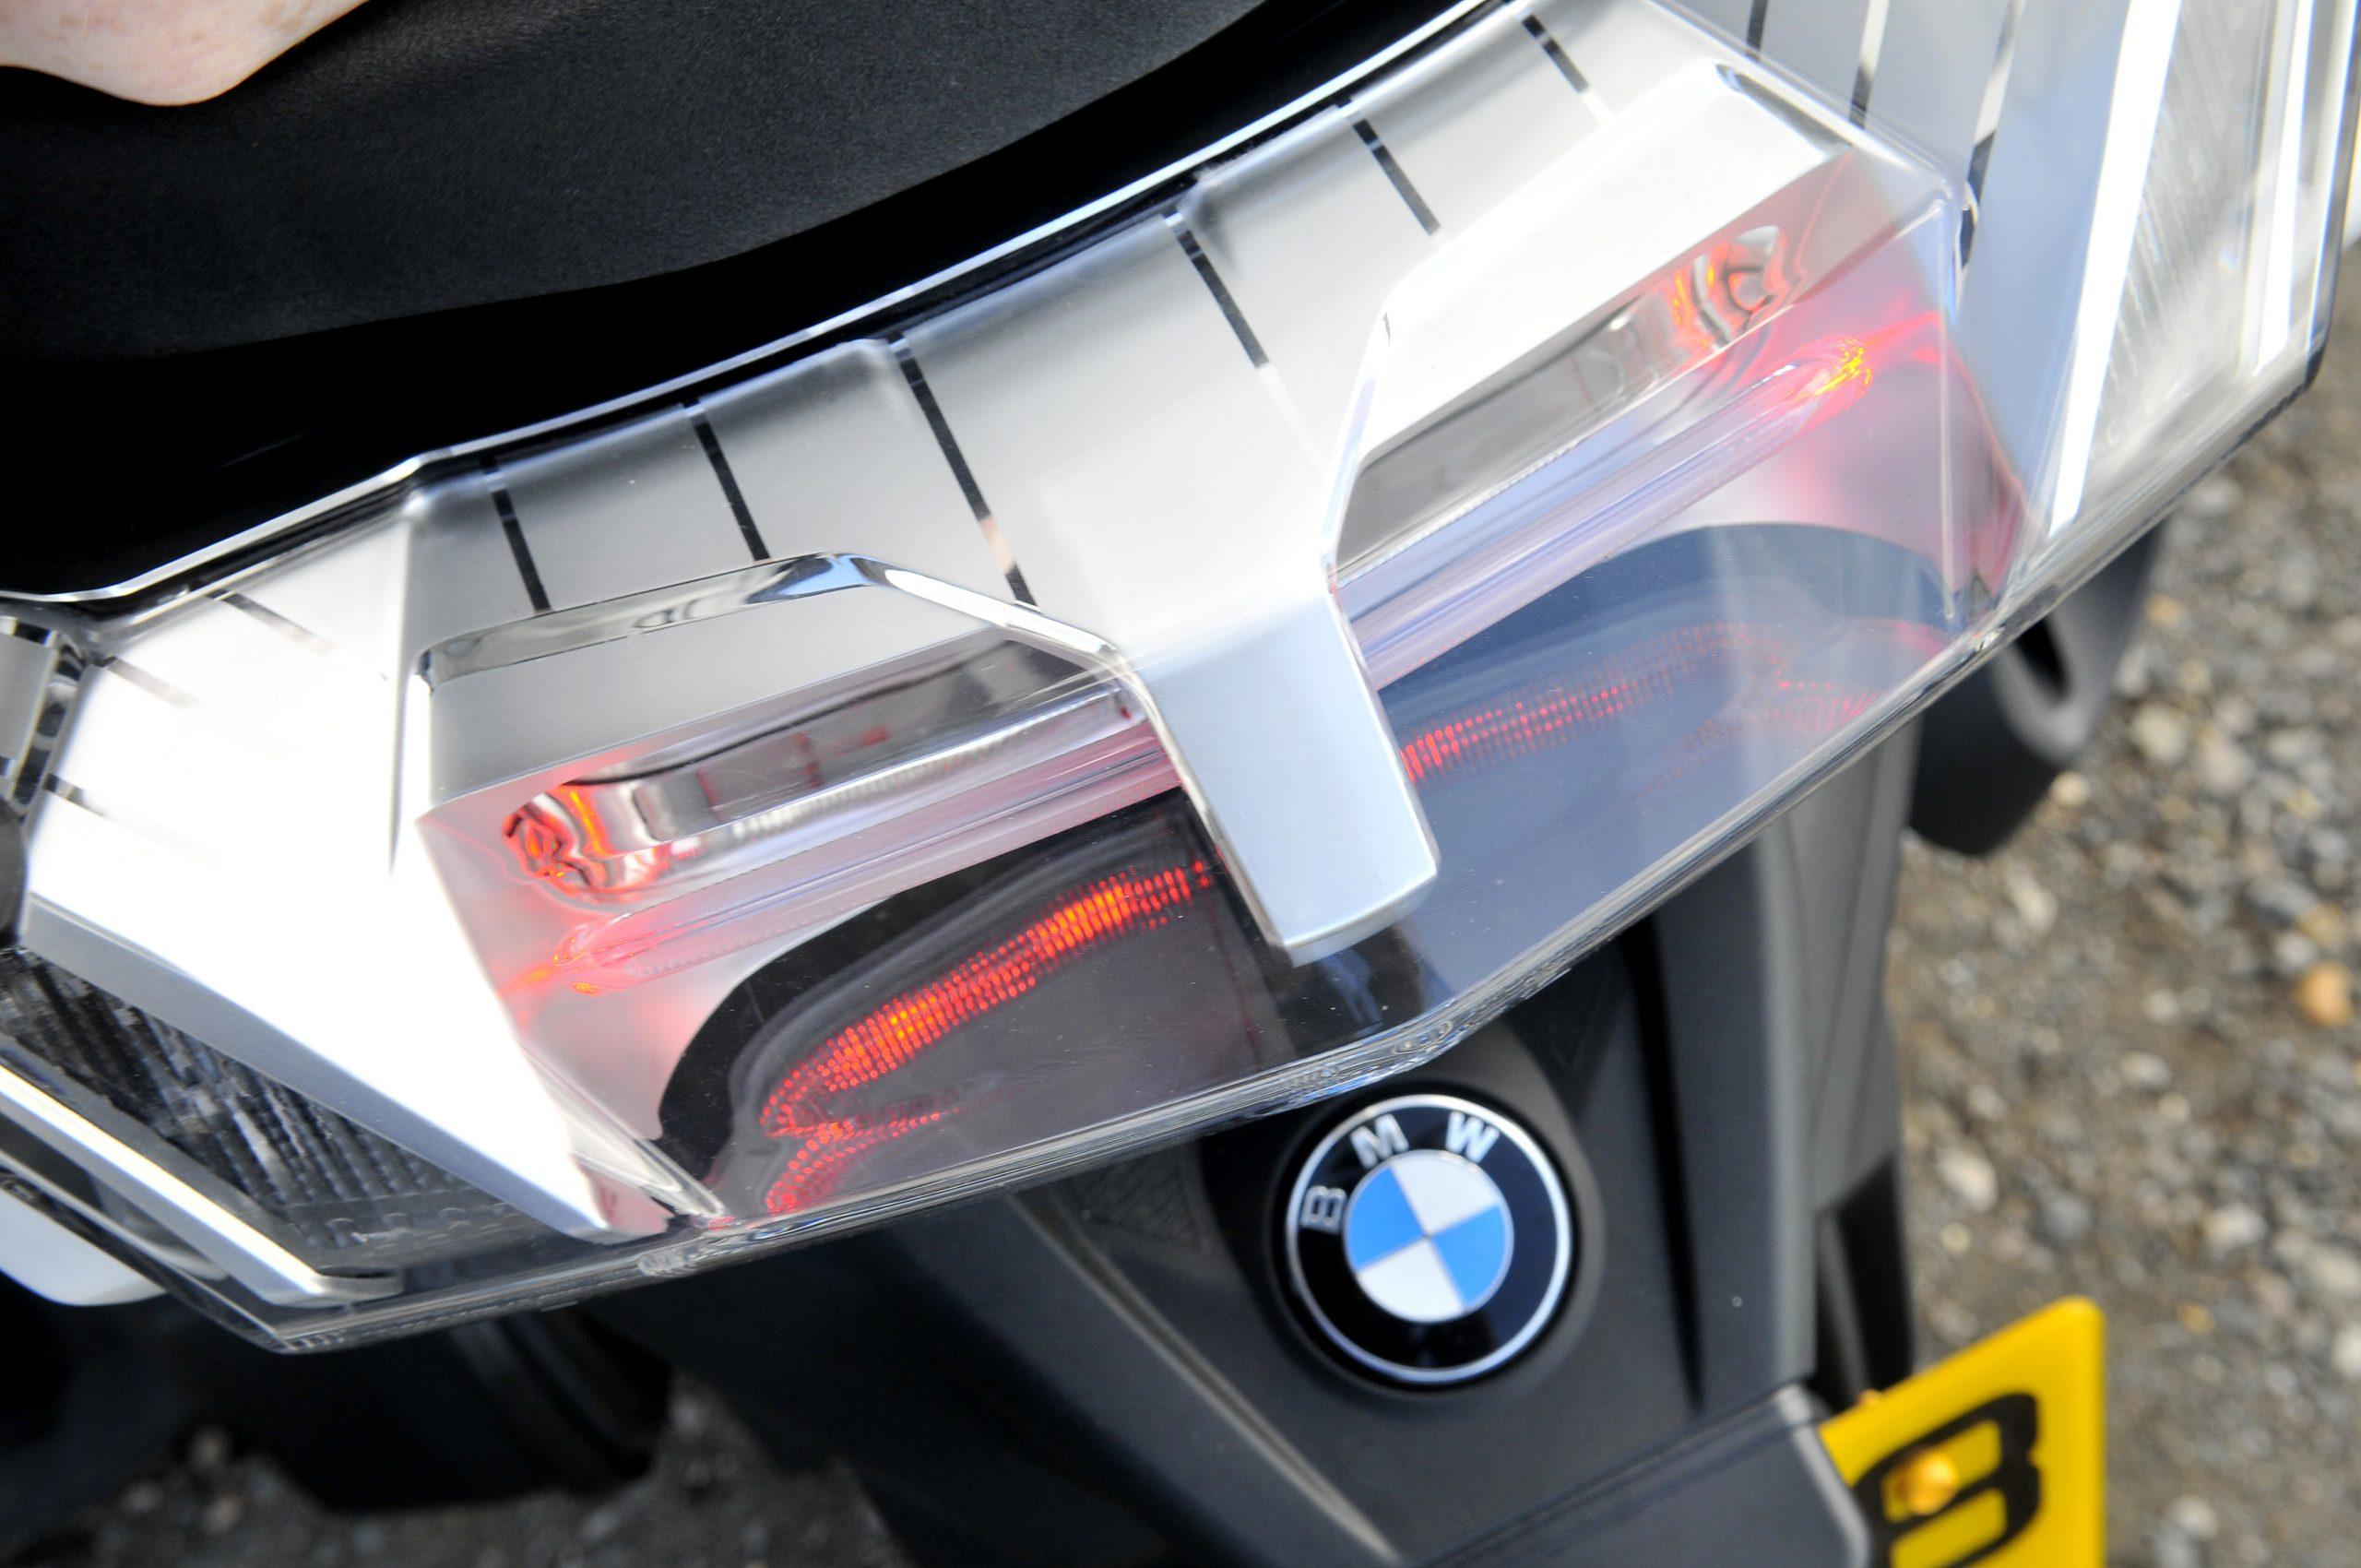 BMW C400 GT light